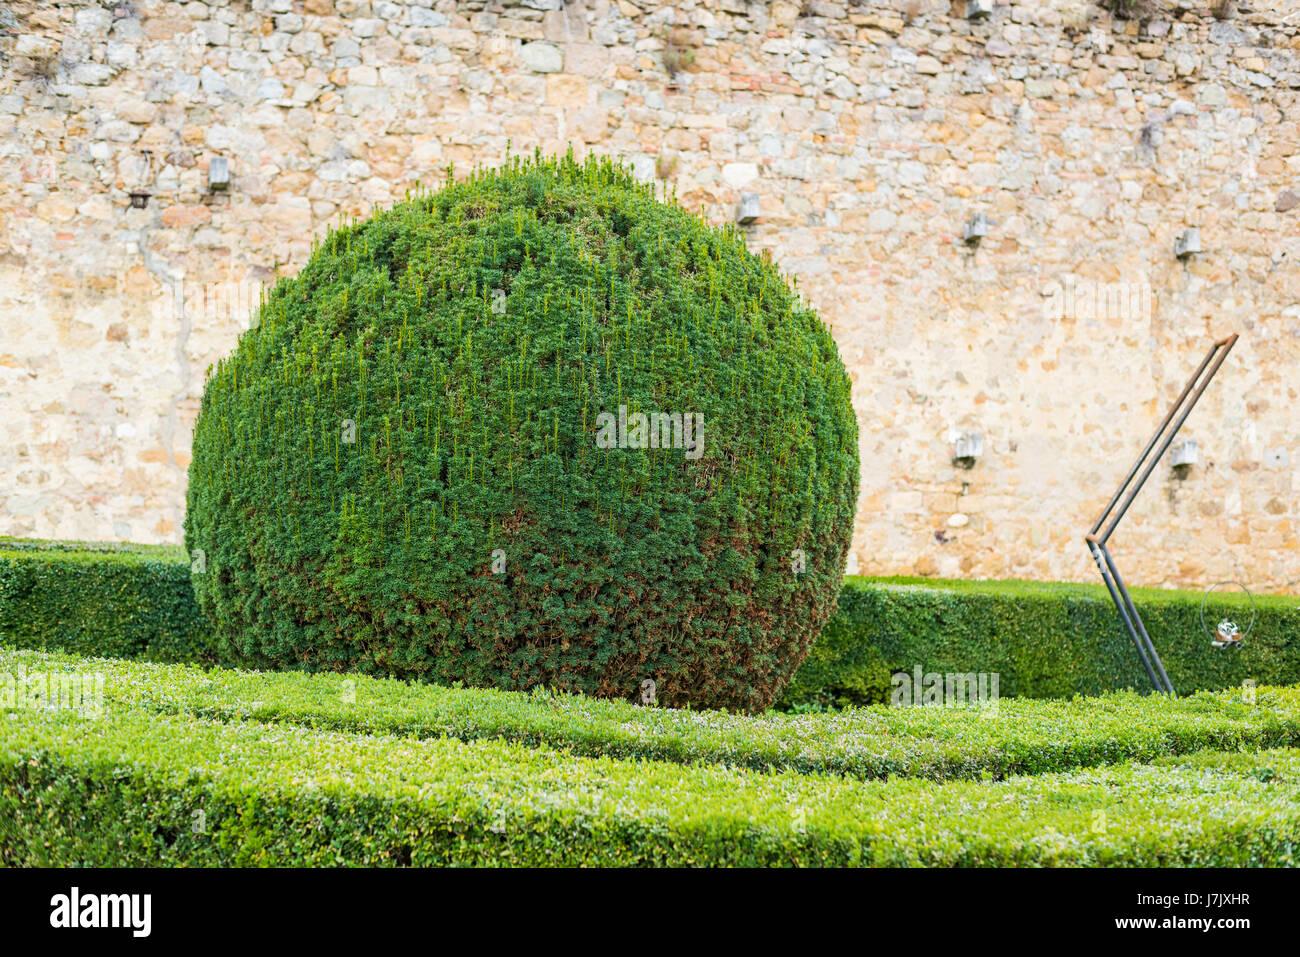 Round Bush In A Tuscan Garden, Italy